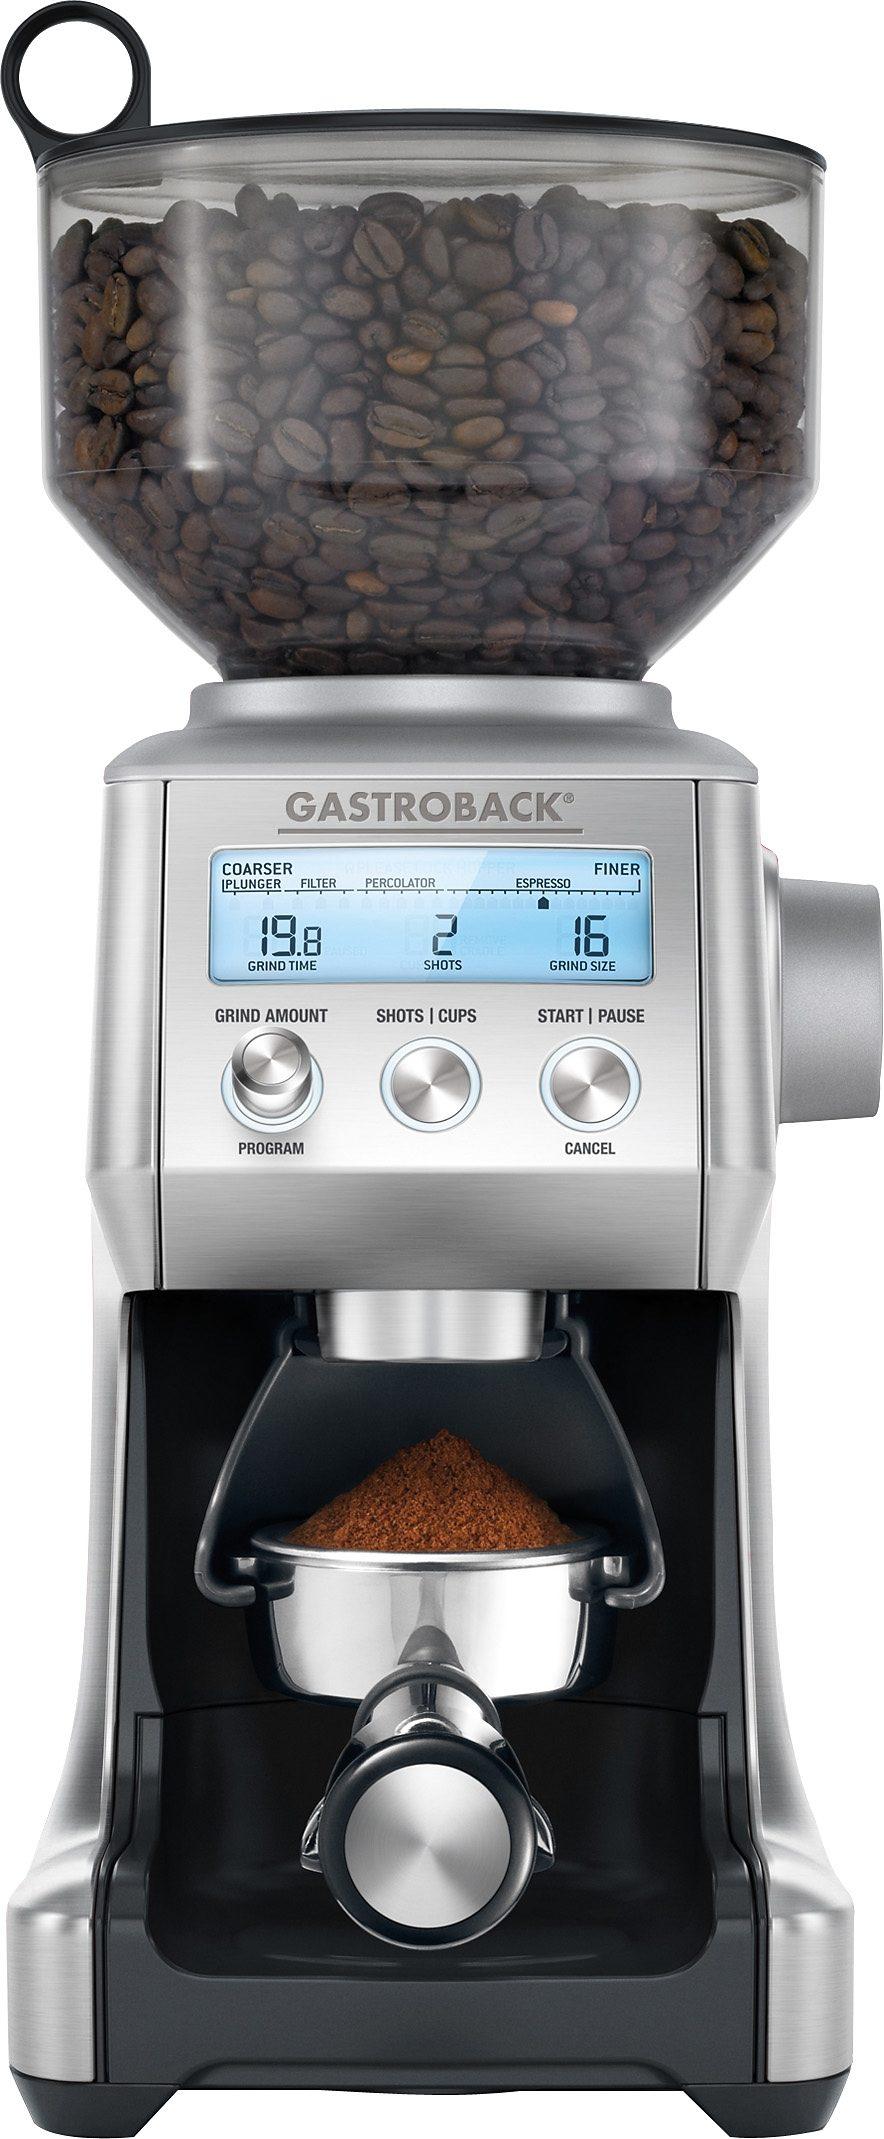 Gastroback Kaffeemühle Advanced Pro 42639, 165 W, Kegelmahlwerk, 450 g Bohnenbehälter, inkl. Siebträgeradapter